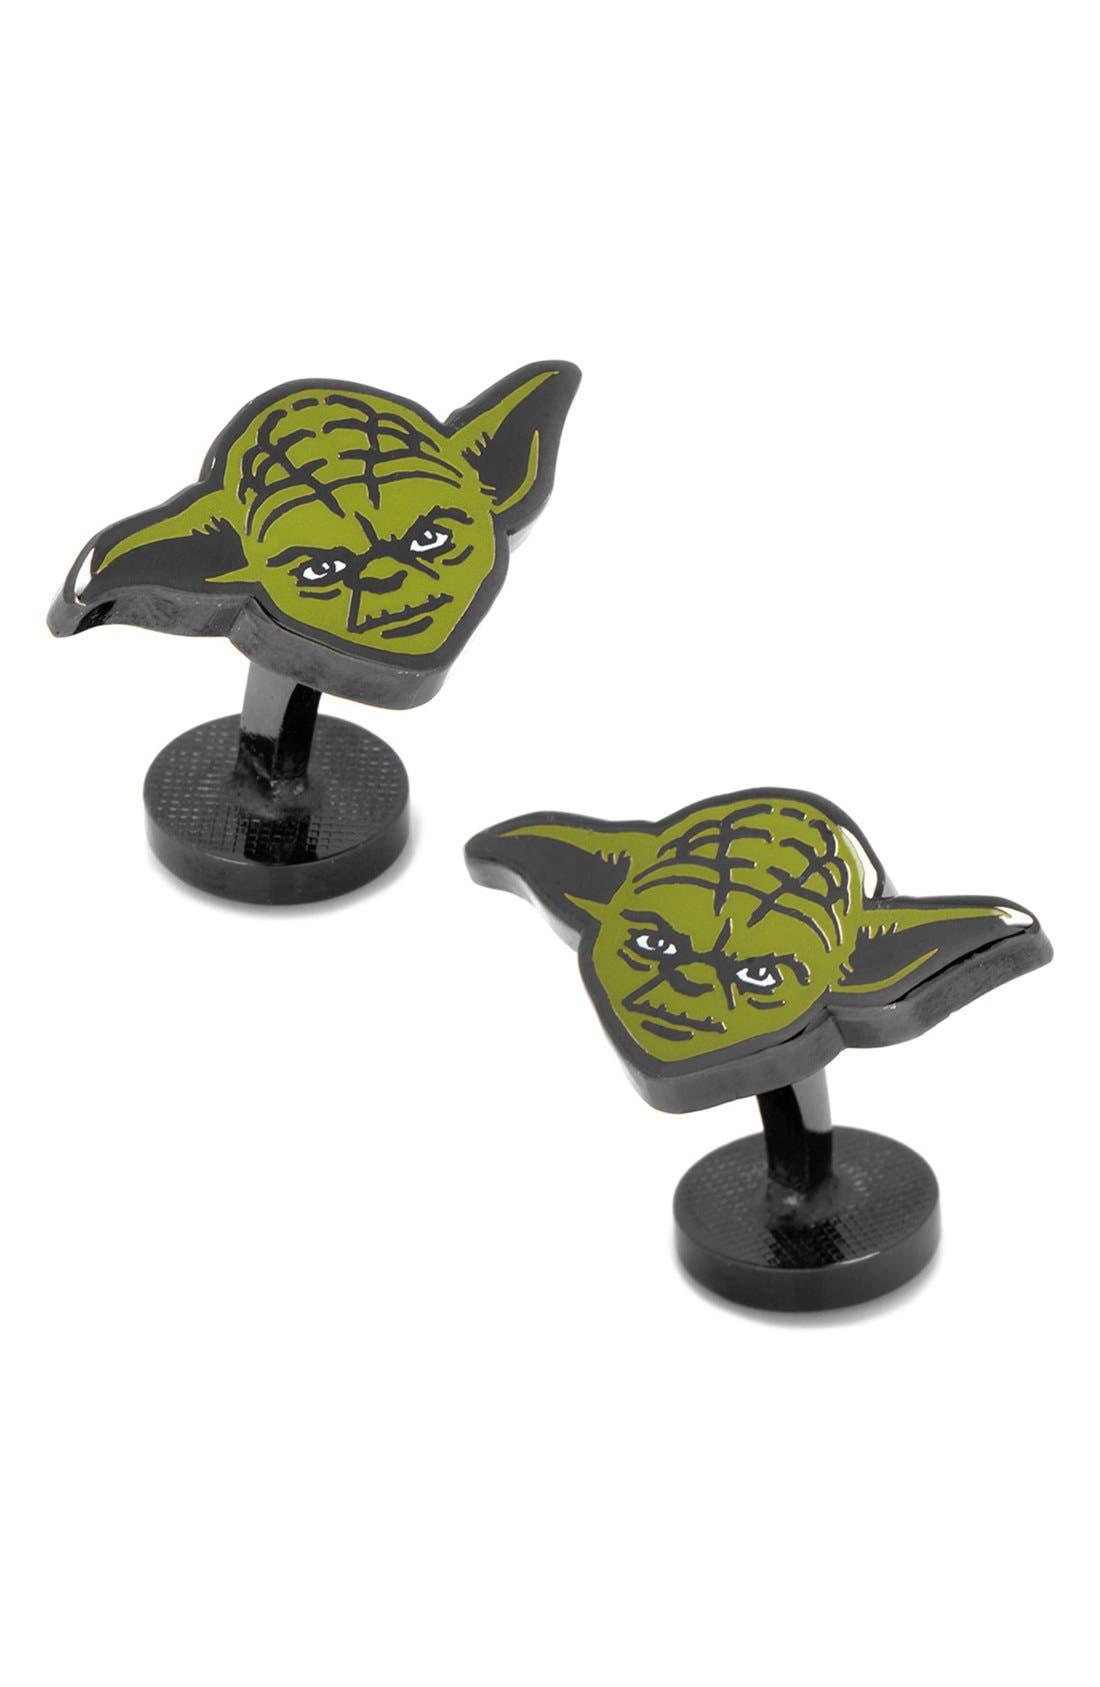 'Star Wars - Yoda' Cuff Links,                             Main thumbnail 1, color,                             001